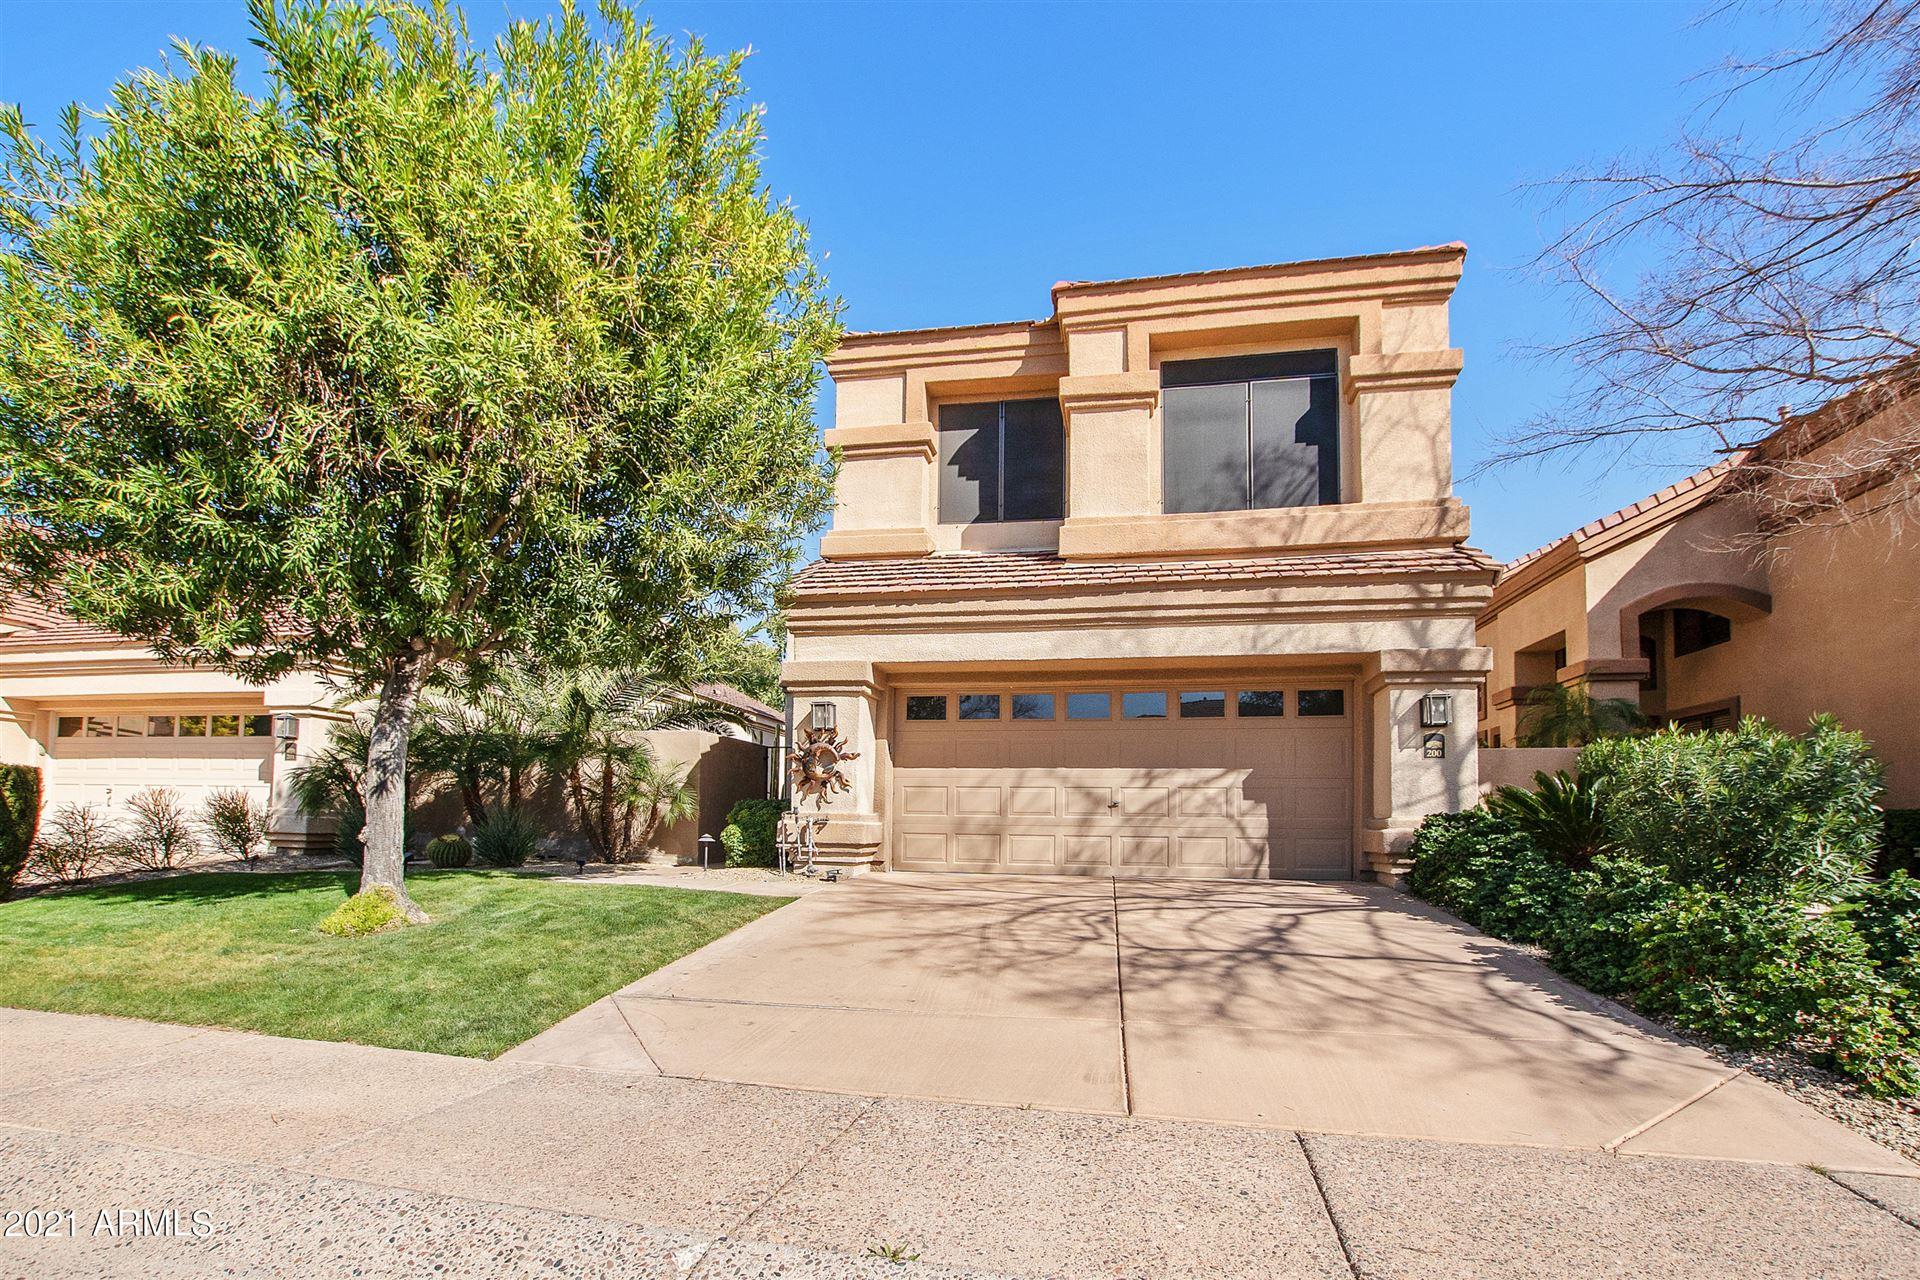 Photo of 7525 E GAINEY RANCH Road #200, Scottsdale, AZ 85258 (MLS # 6200969)